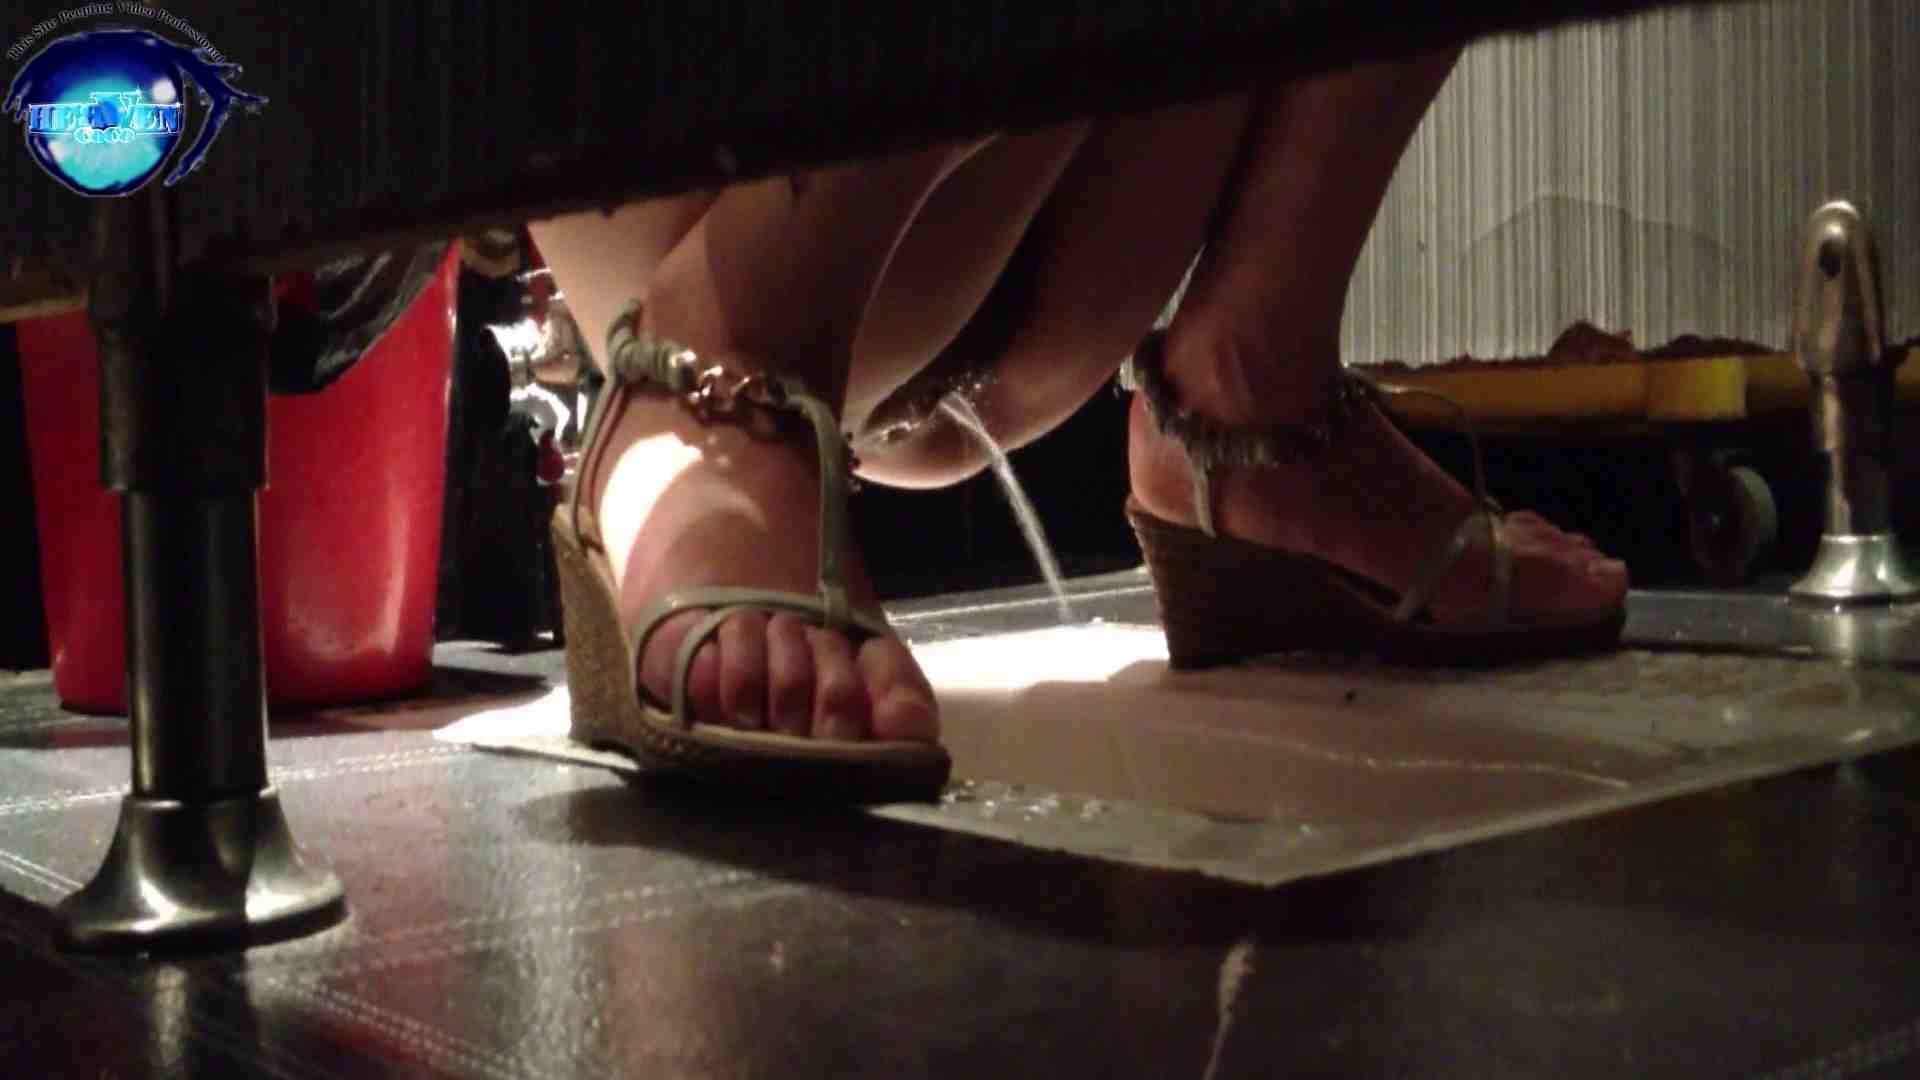 GOD HAND ファッションショッピングセンター盗撮vol.03前編 美人 盗撮動画紹介 46連発 10